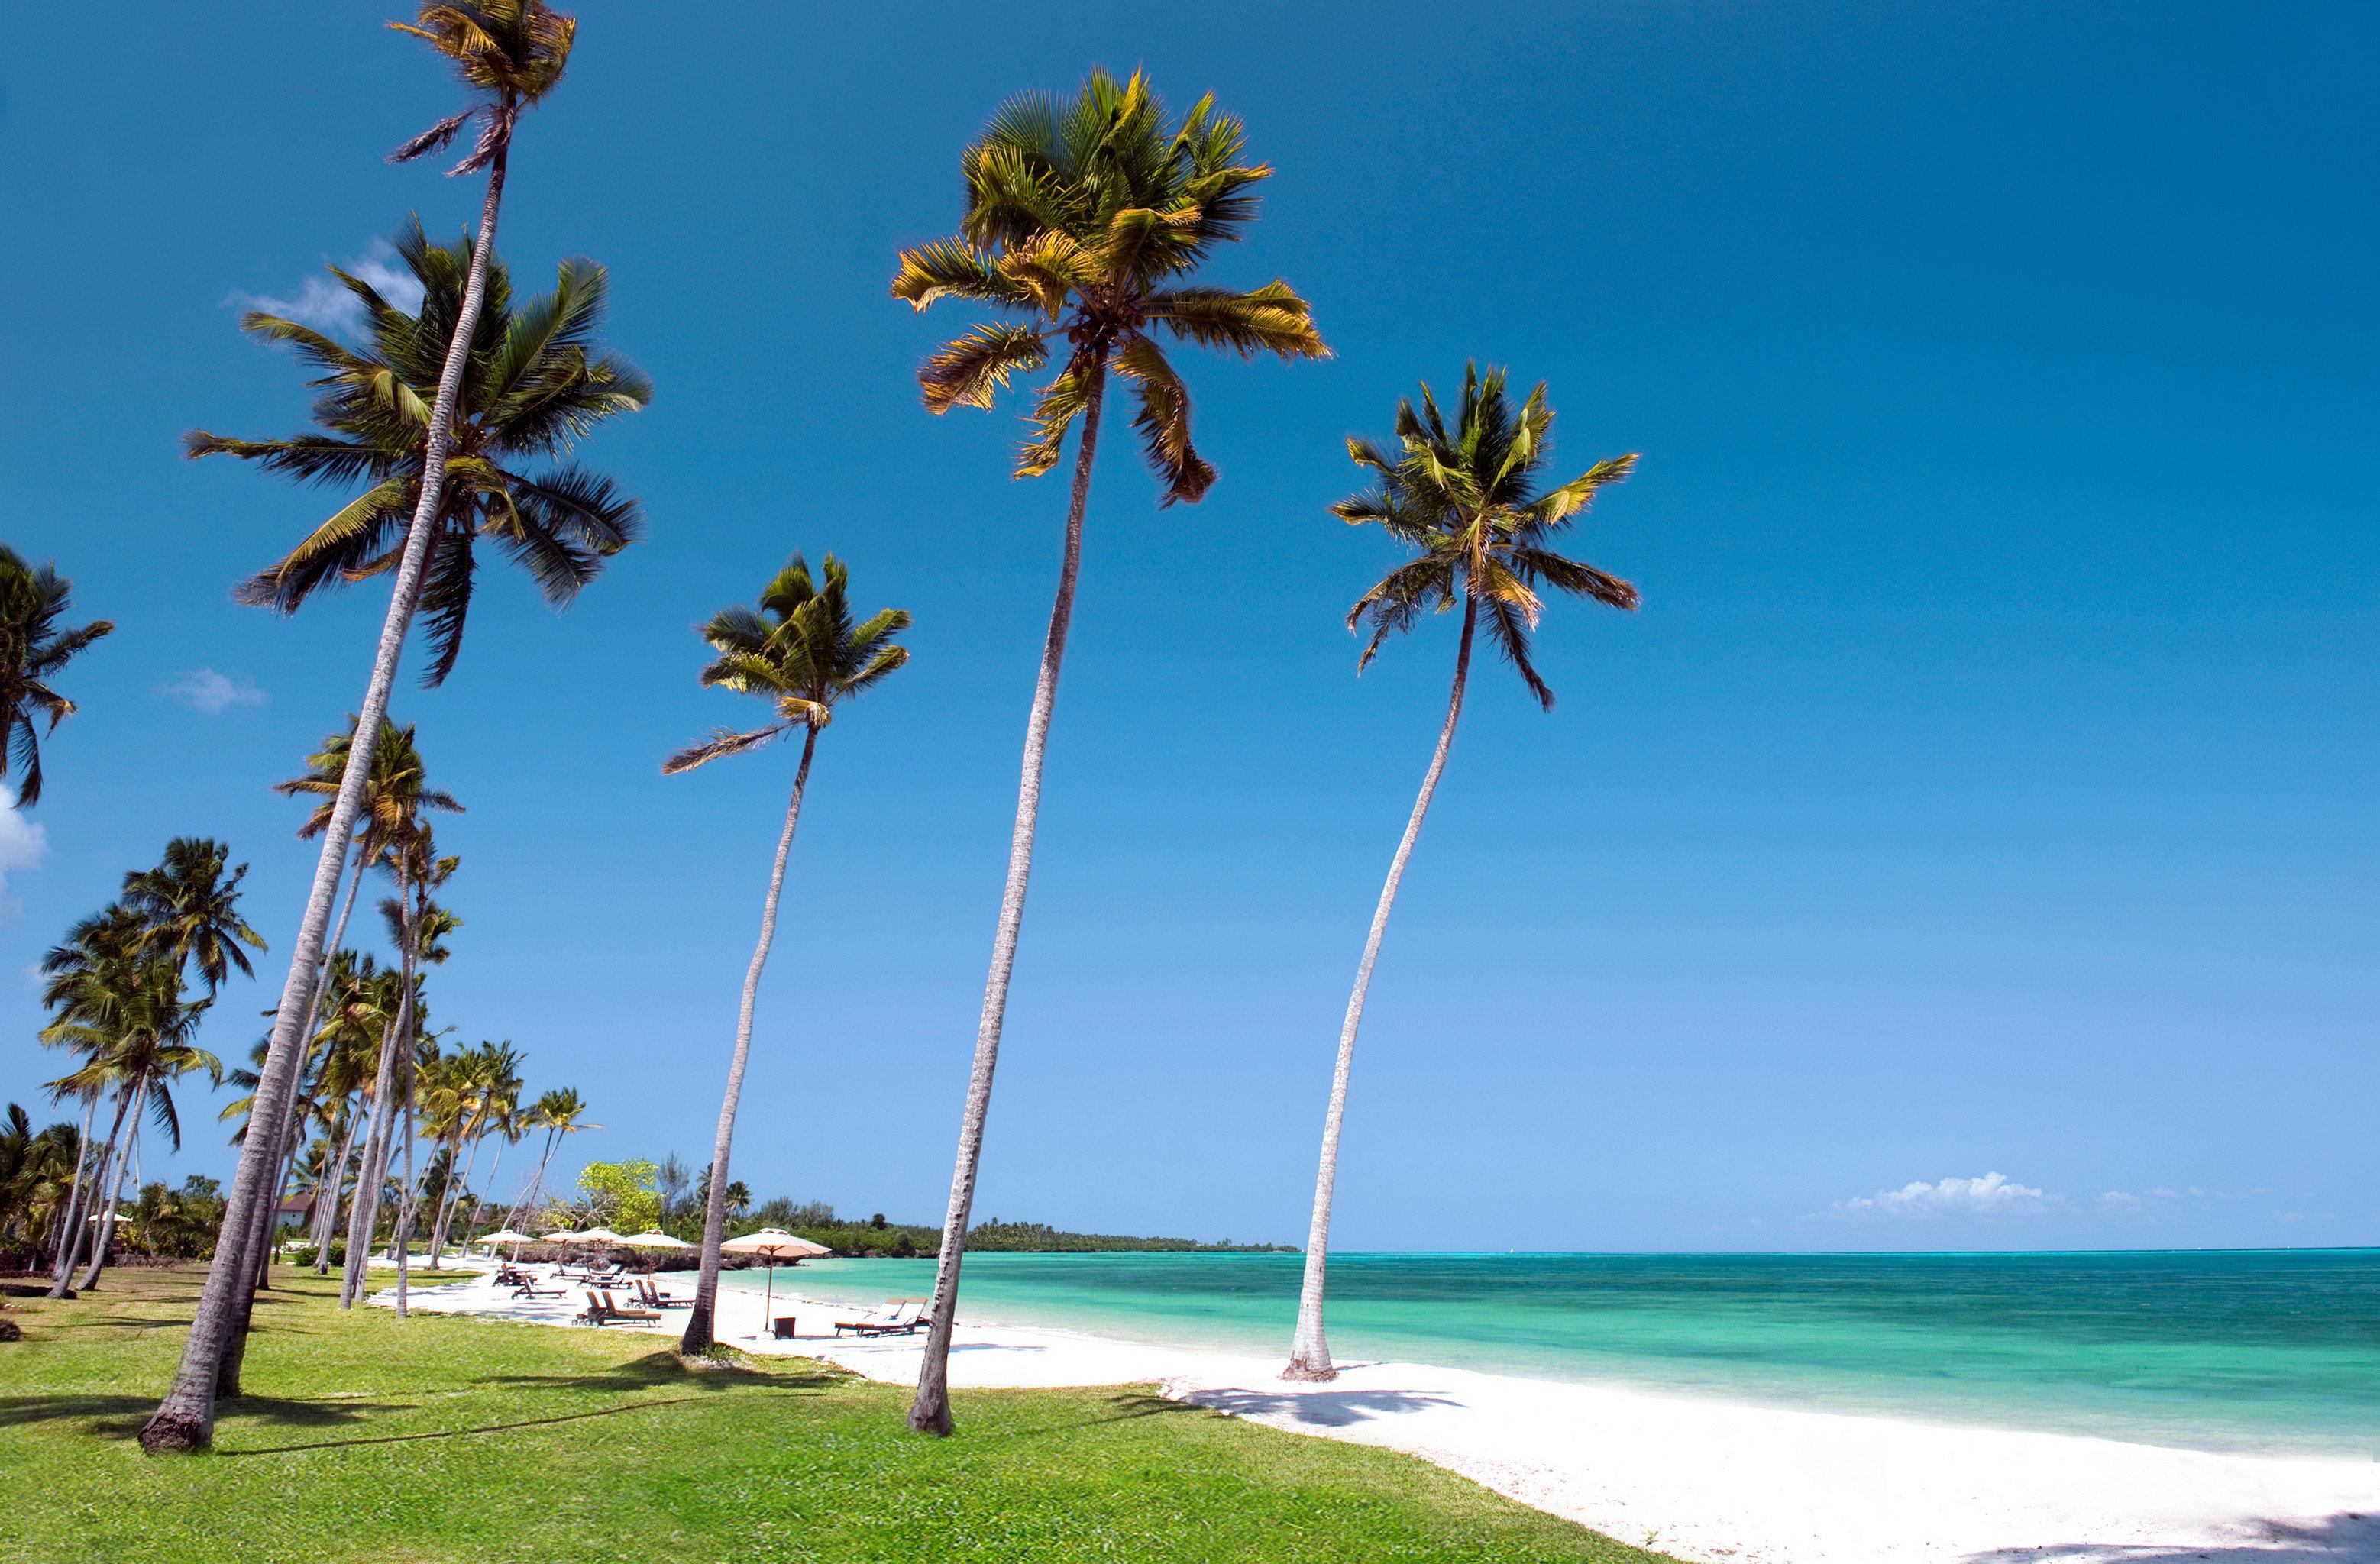 Beach Beachfront Family Luxury Nature Ocean Outdoors Resort Scenic views sky tree palm palm family plant Sea arecales woody plant caribbean tropics Coast flower wind Island shore sandy